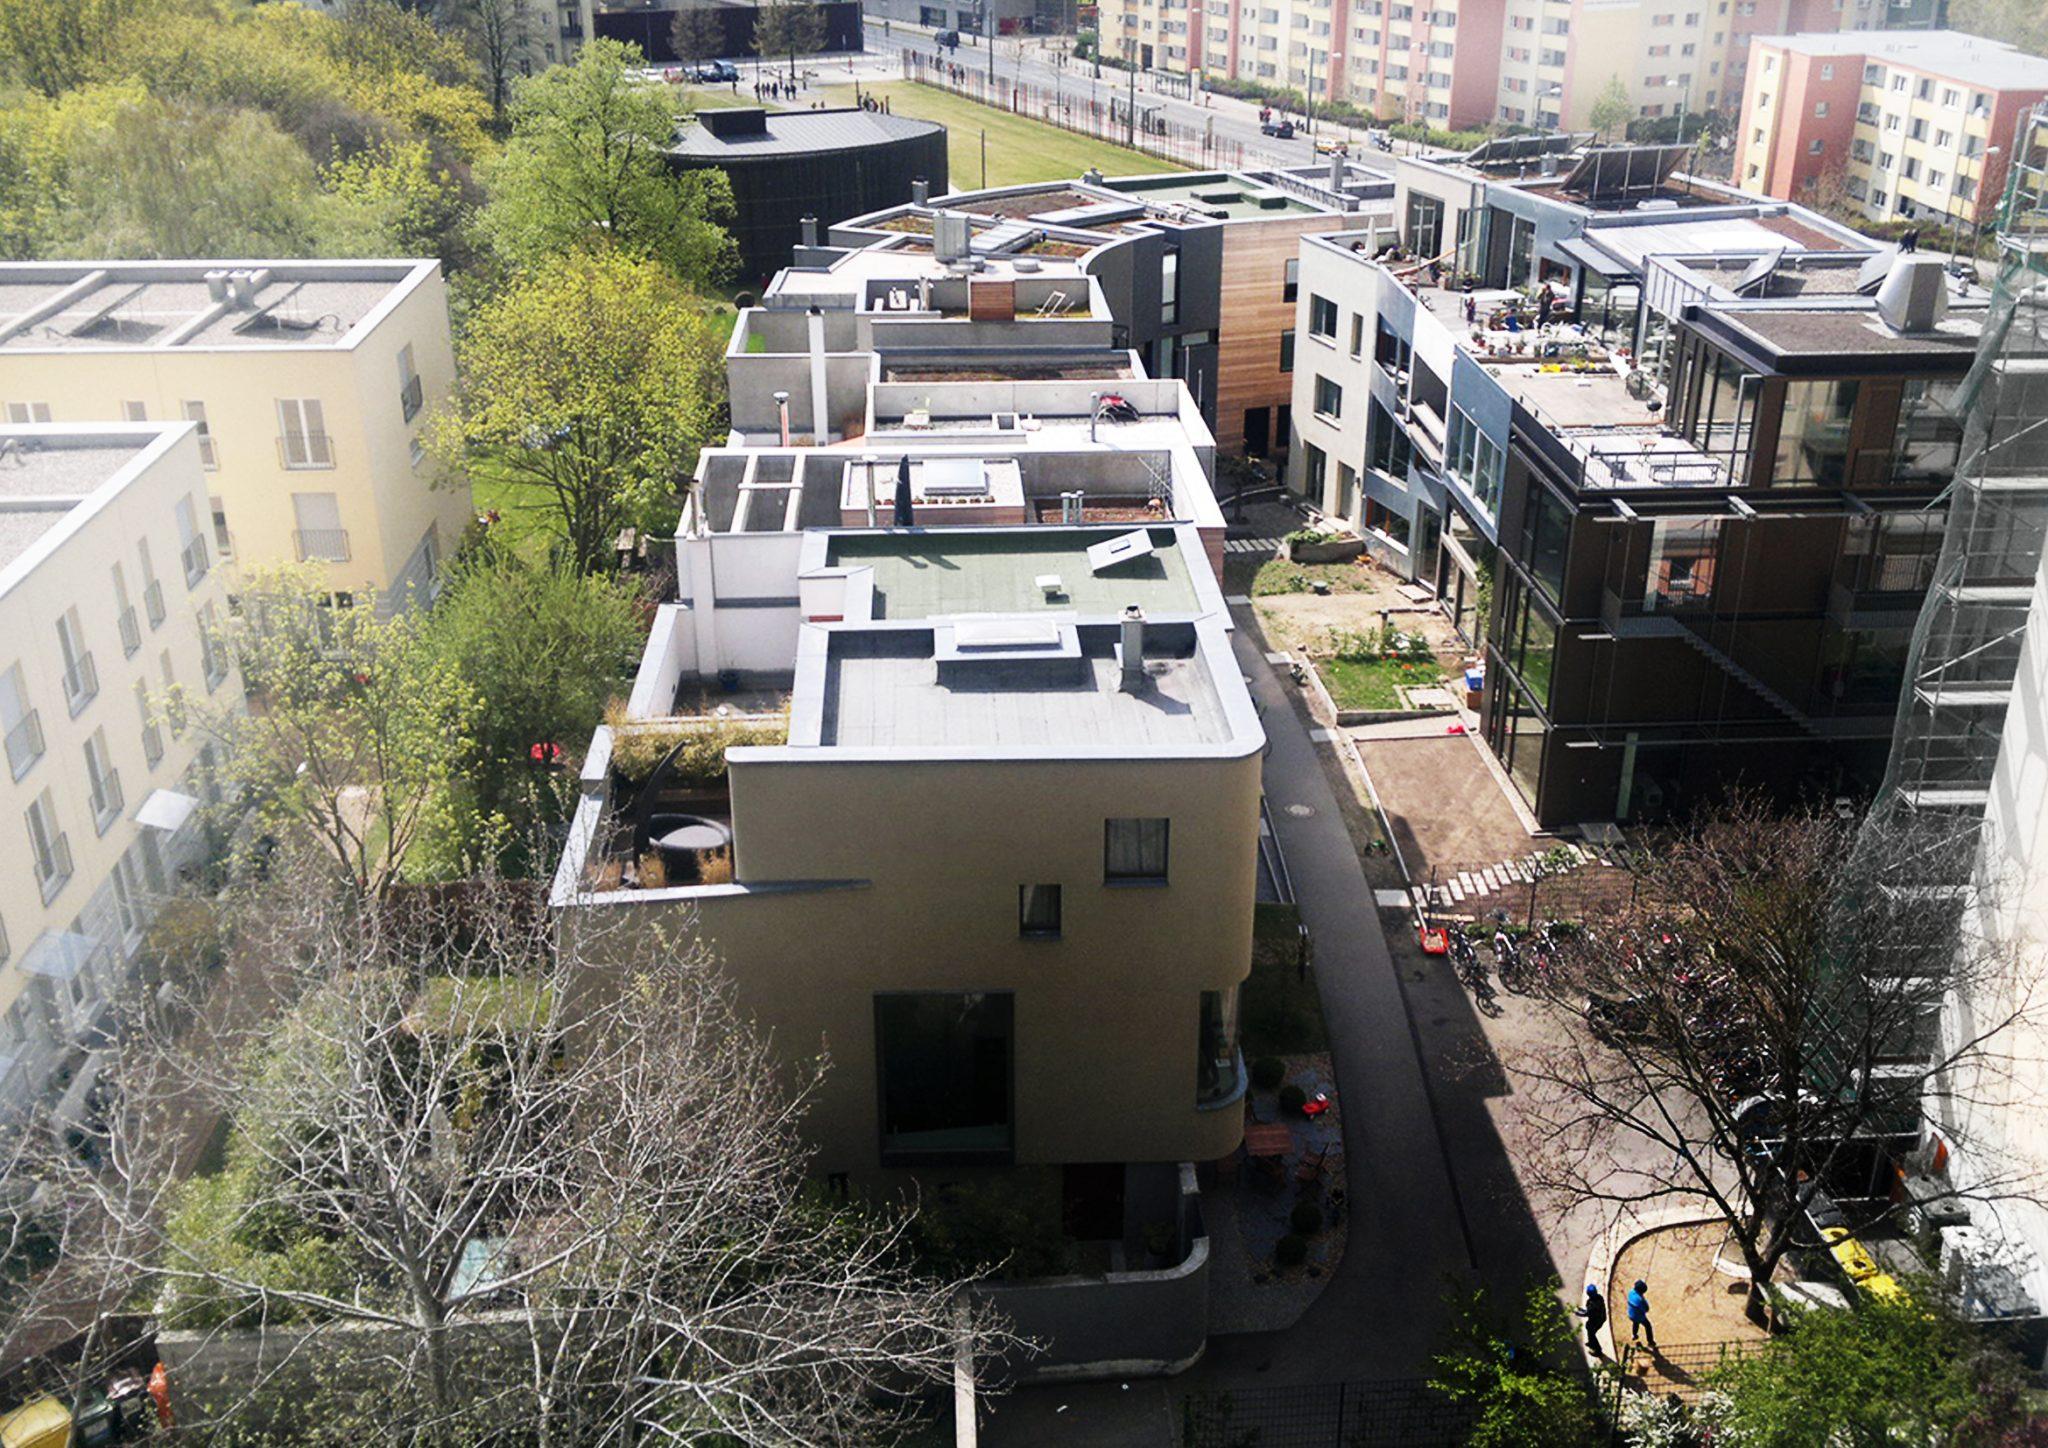 021 berlin mieszkaniowka - Berlin - Architour